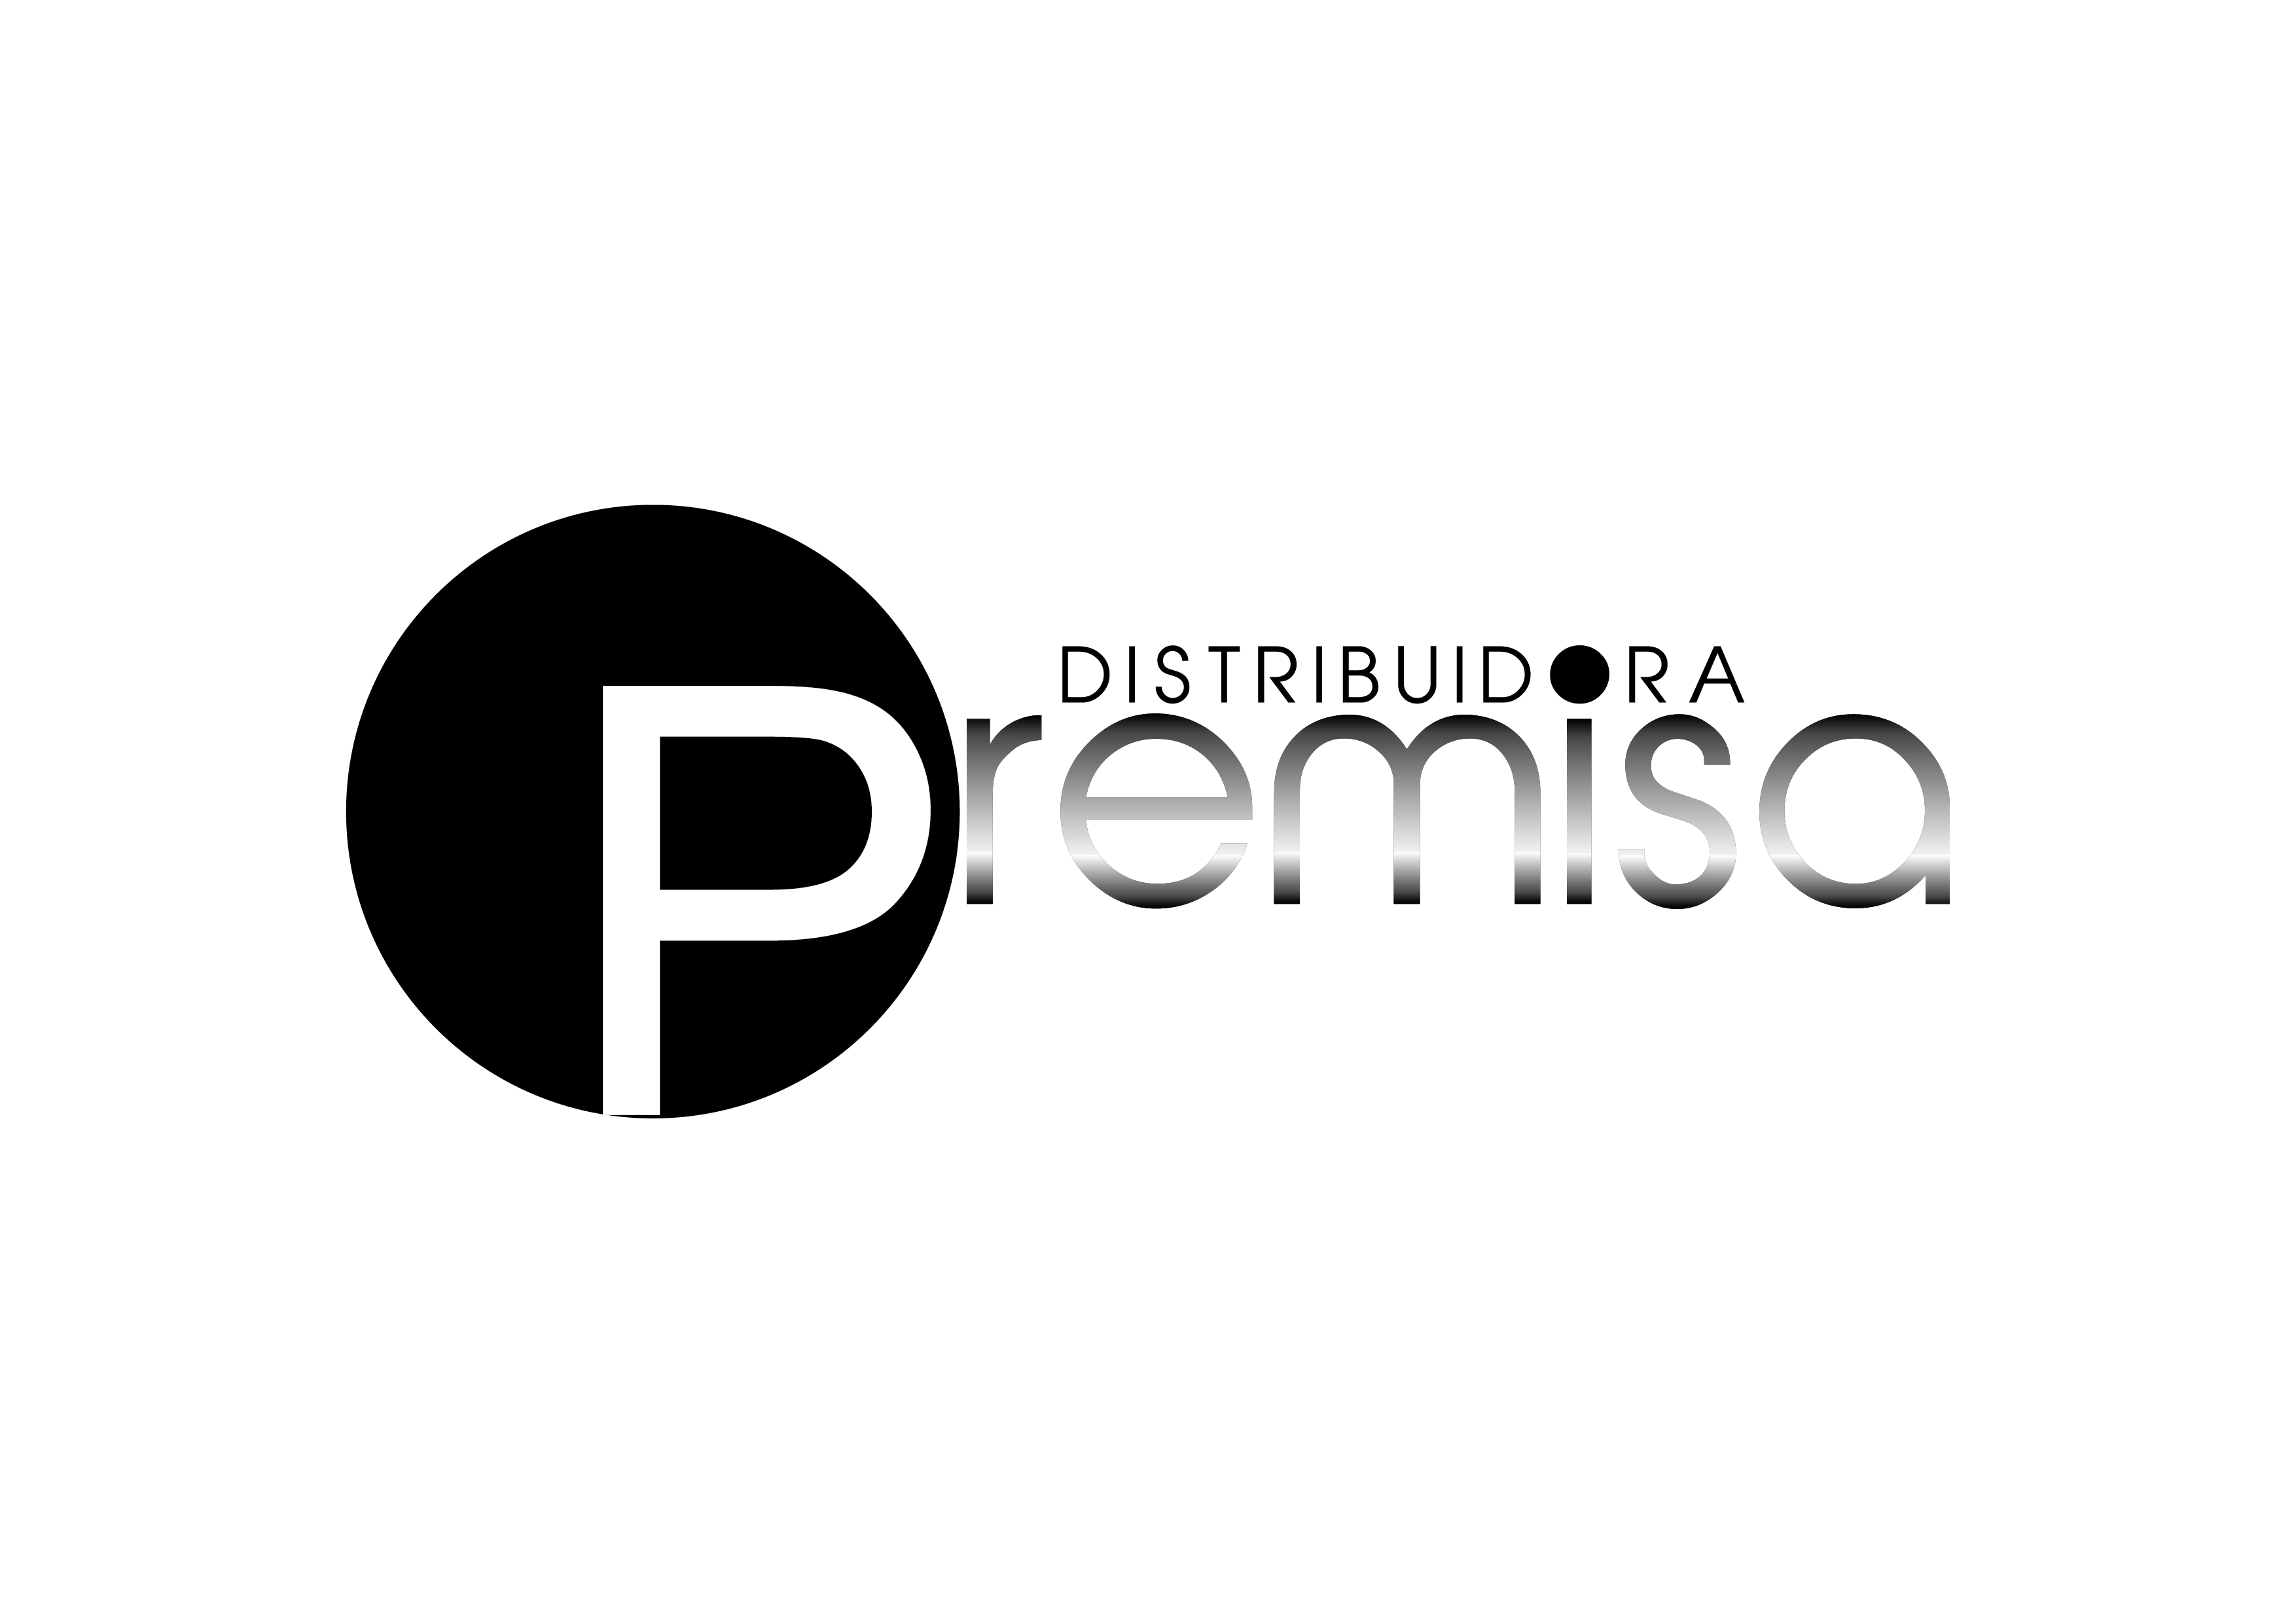 Logo Distribuidora Premisa